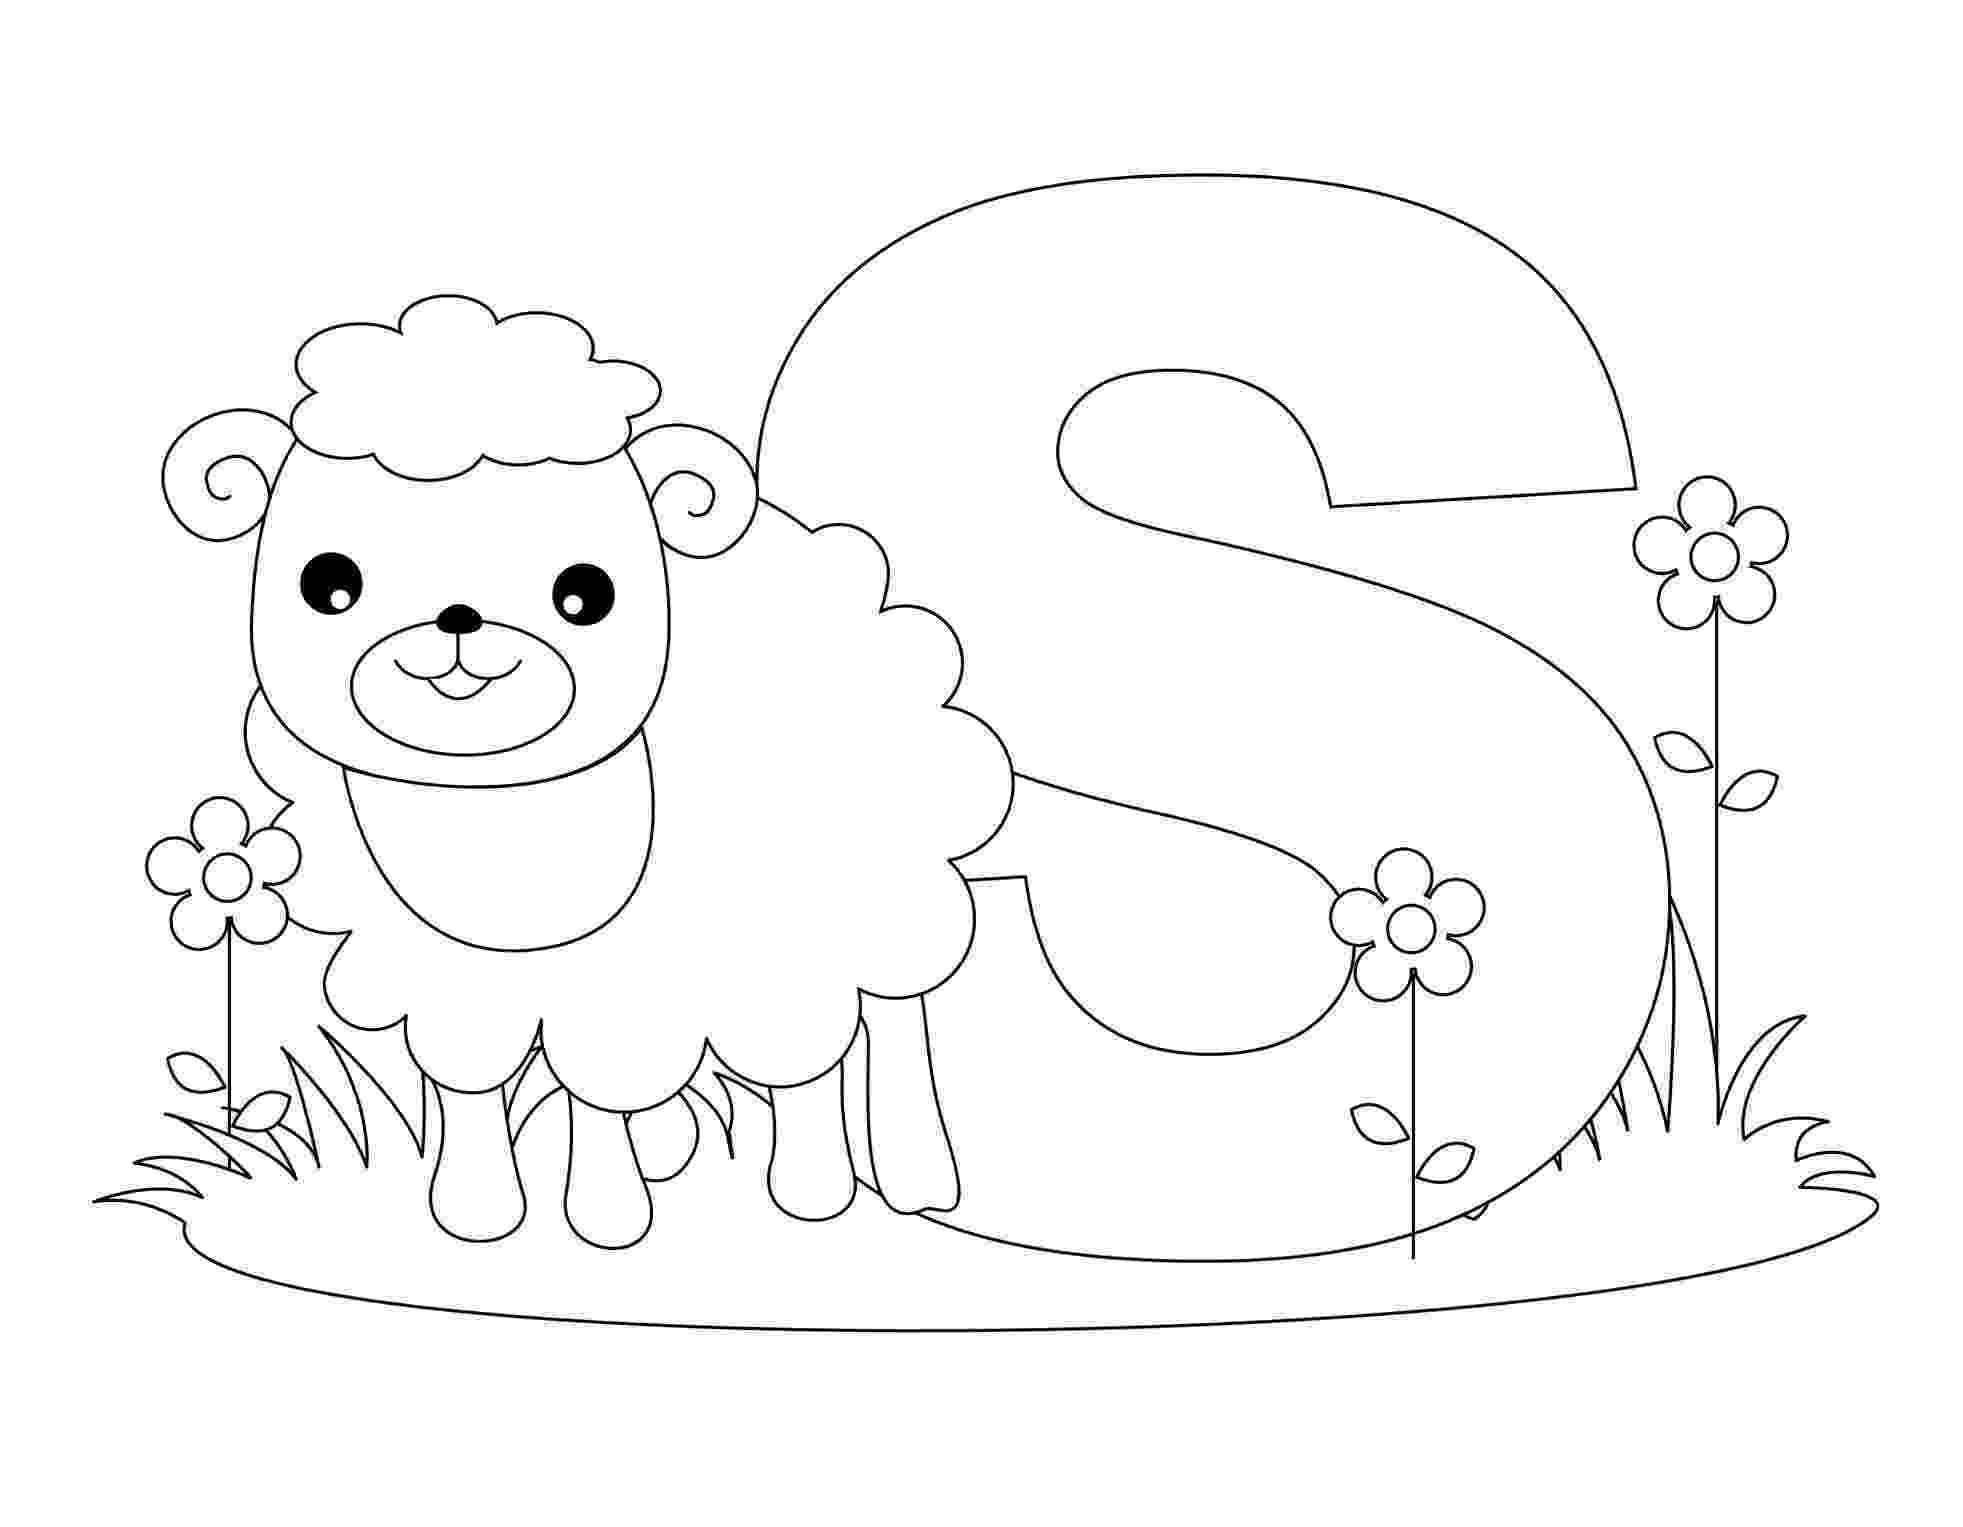 abc coloring sheets free printable alphabet coloring pages for kids best sheets abc coloring 1 3